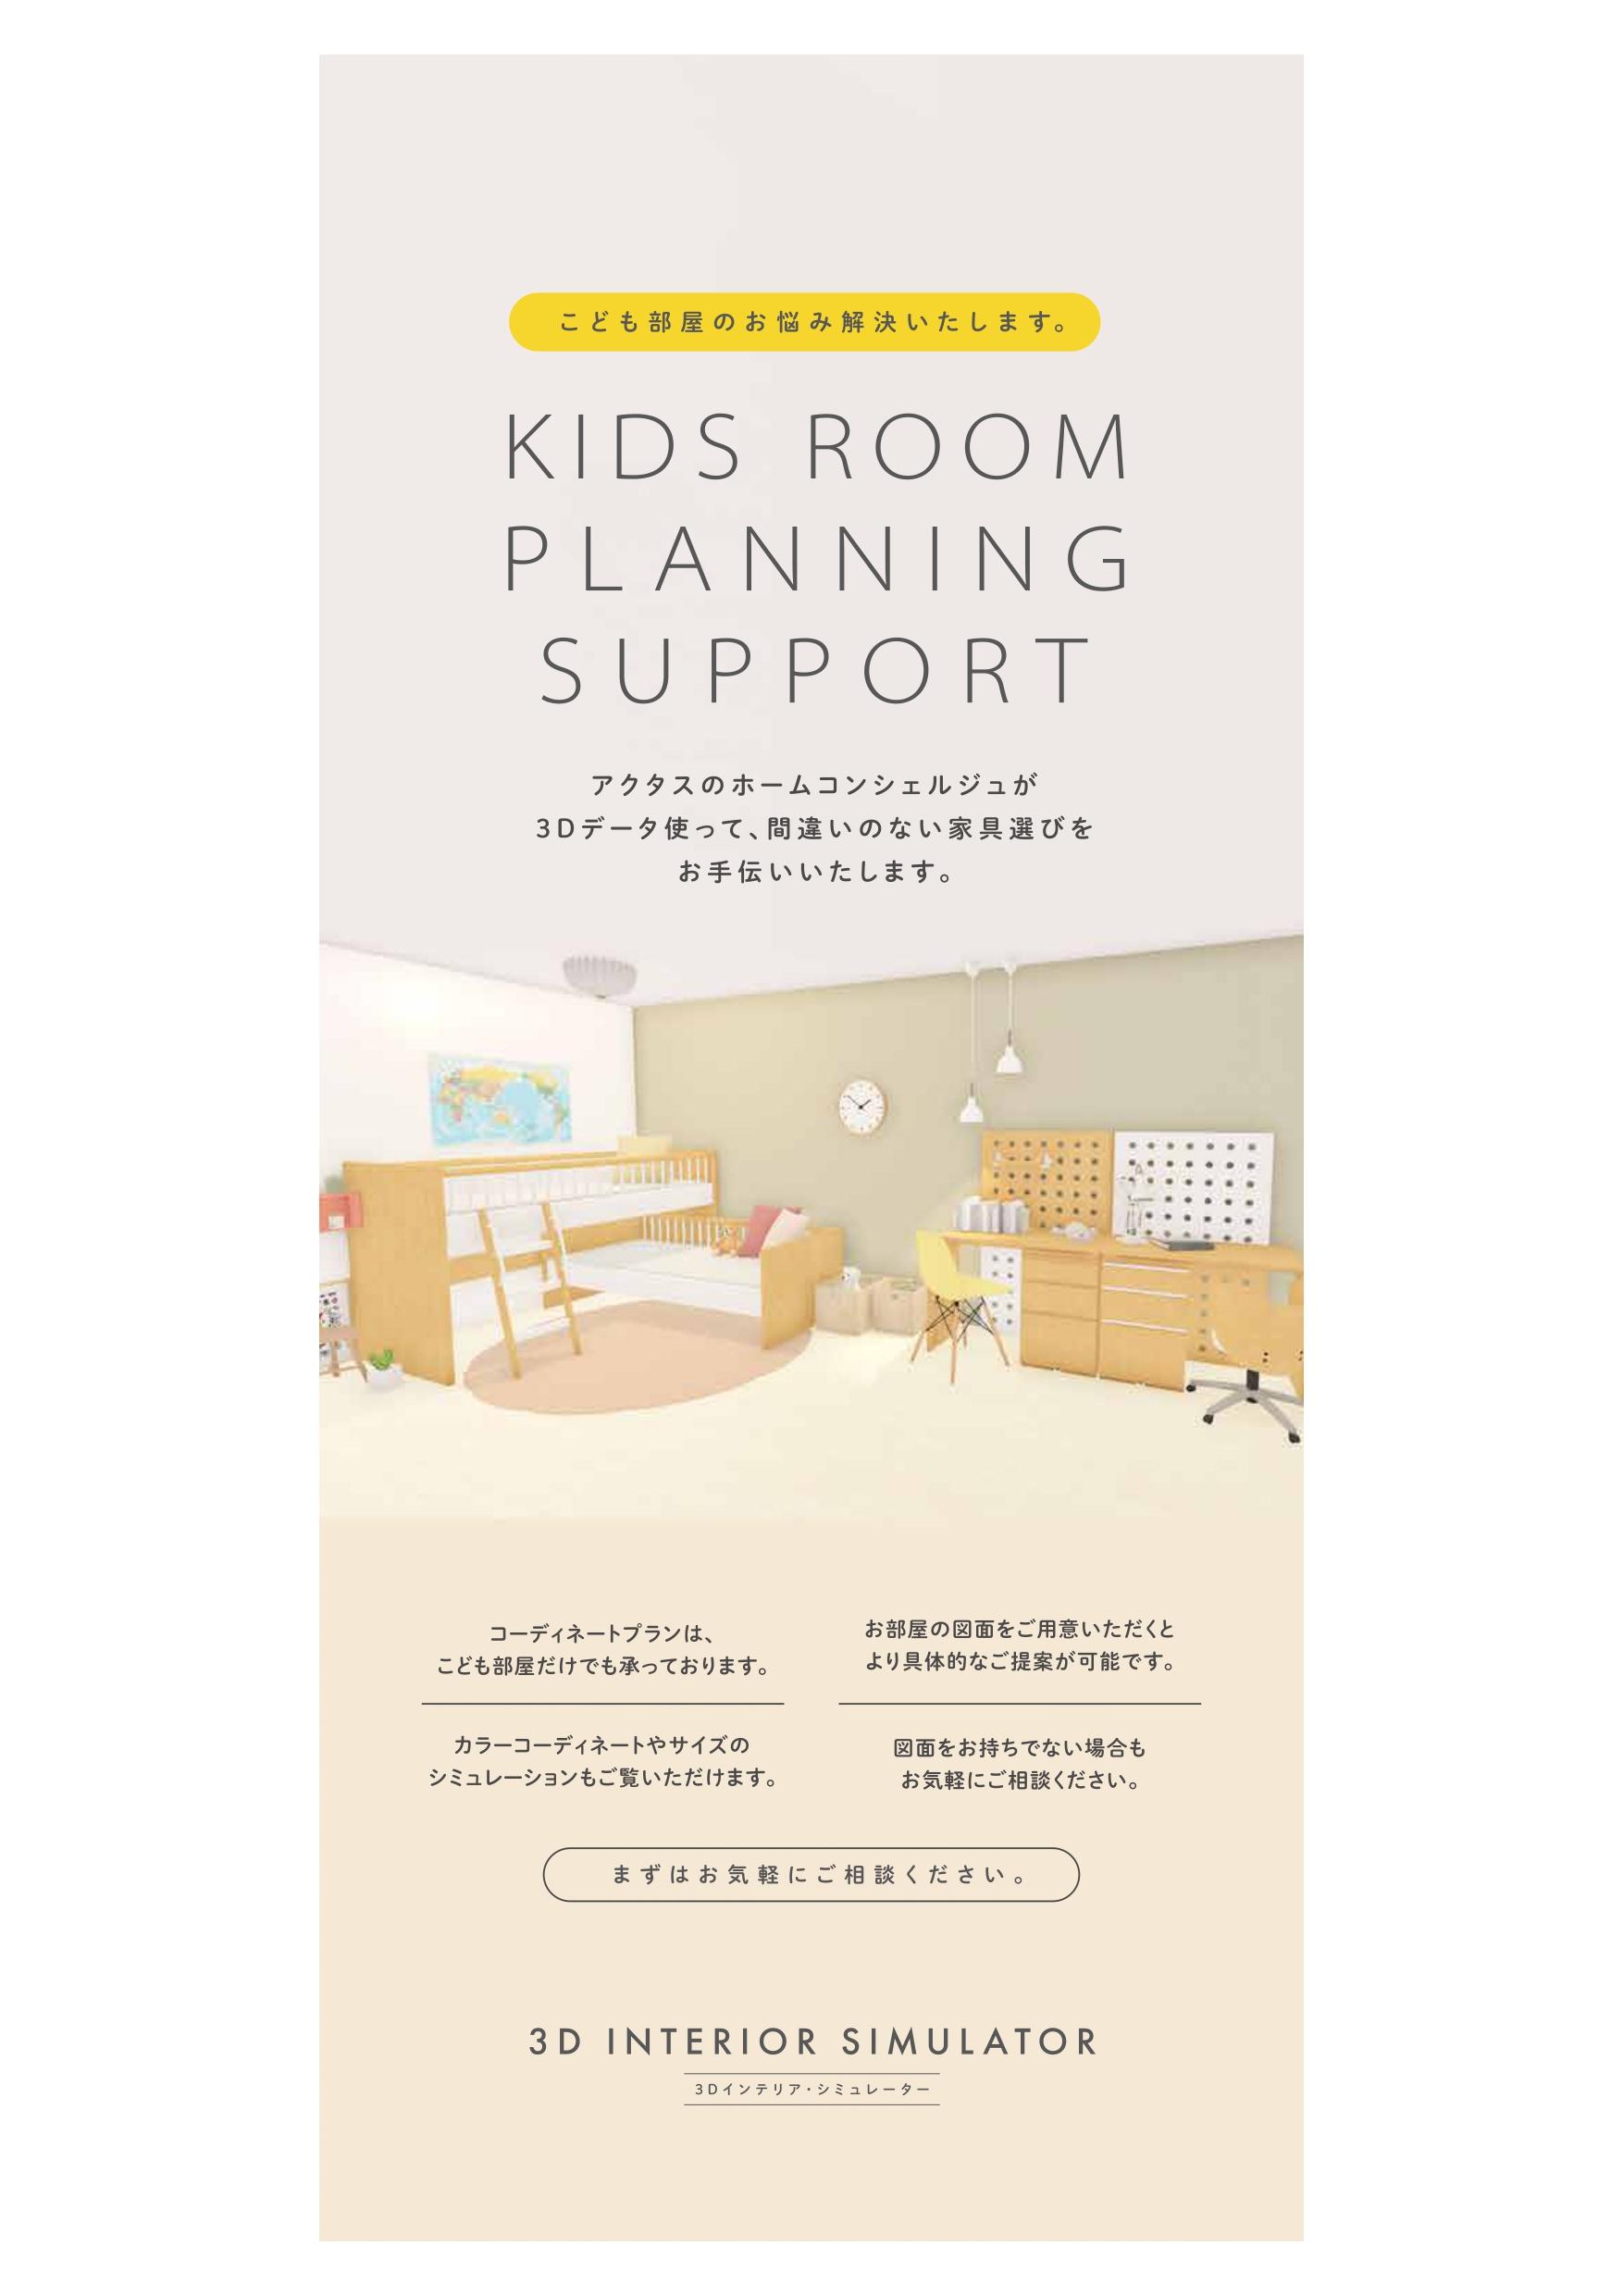 【POP】3D+INTERIOR+PLANNING+KIDS版+縦長_page-0001 (1)